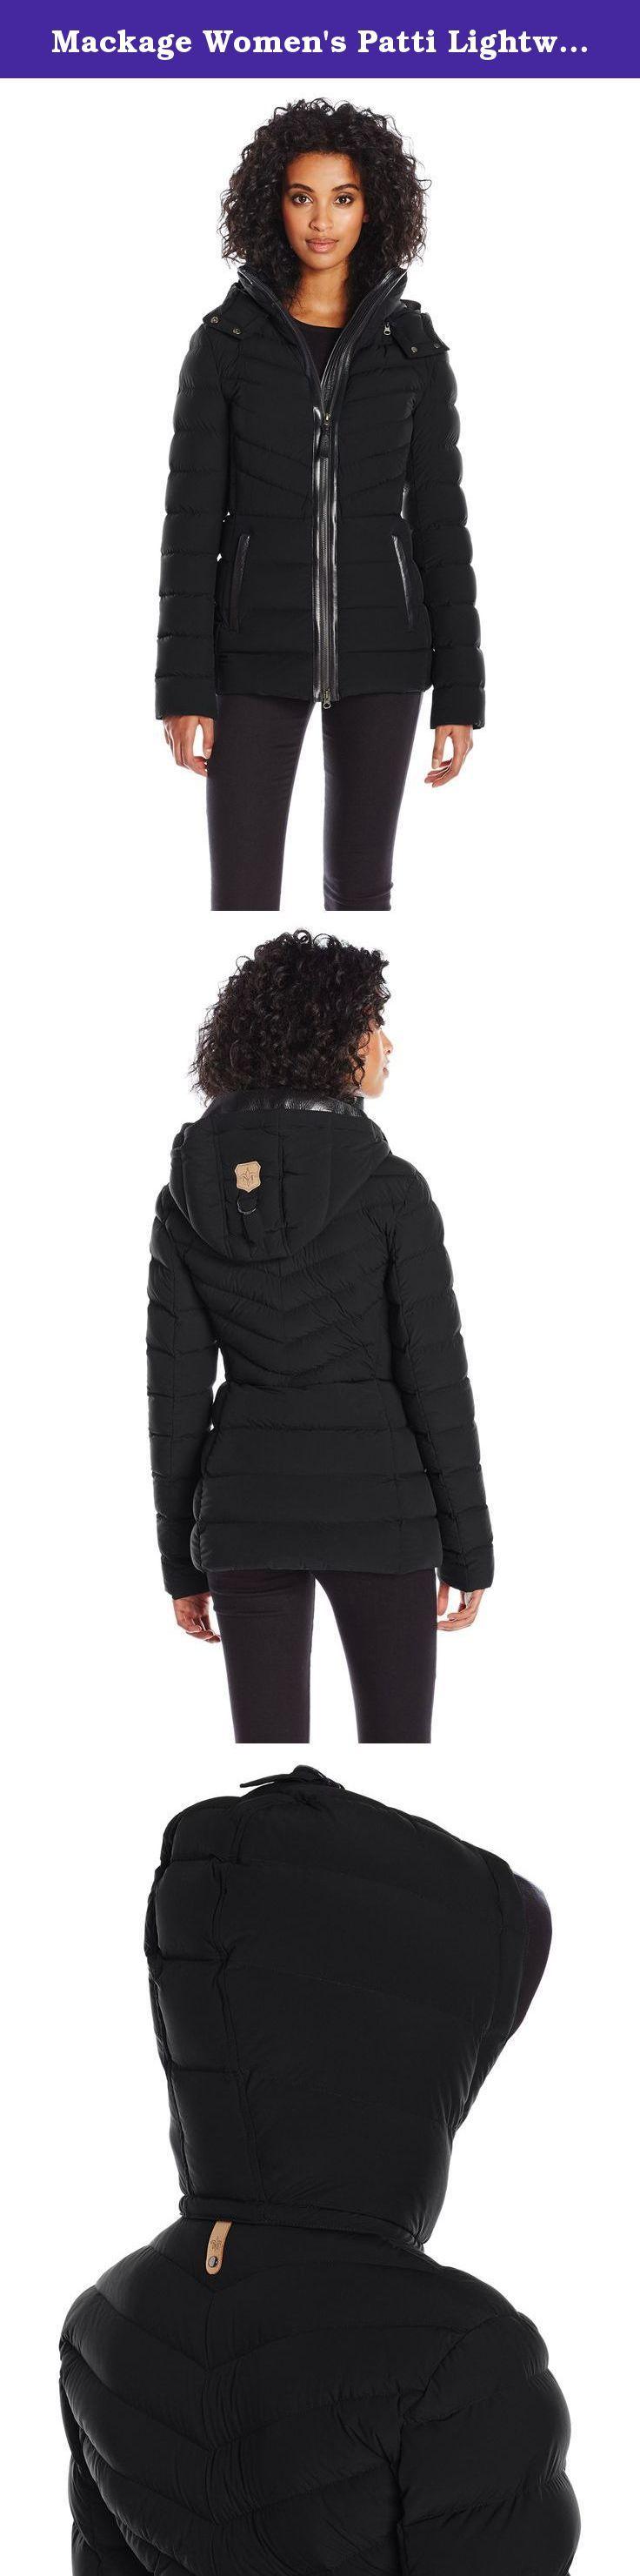 Mackage Women's Patti Lightweight Down Jacket, Black, XS. Ladies lightweight down jacket with removable hood with leather visor.